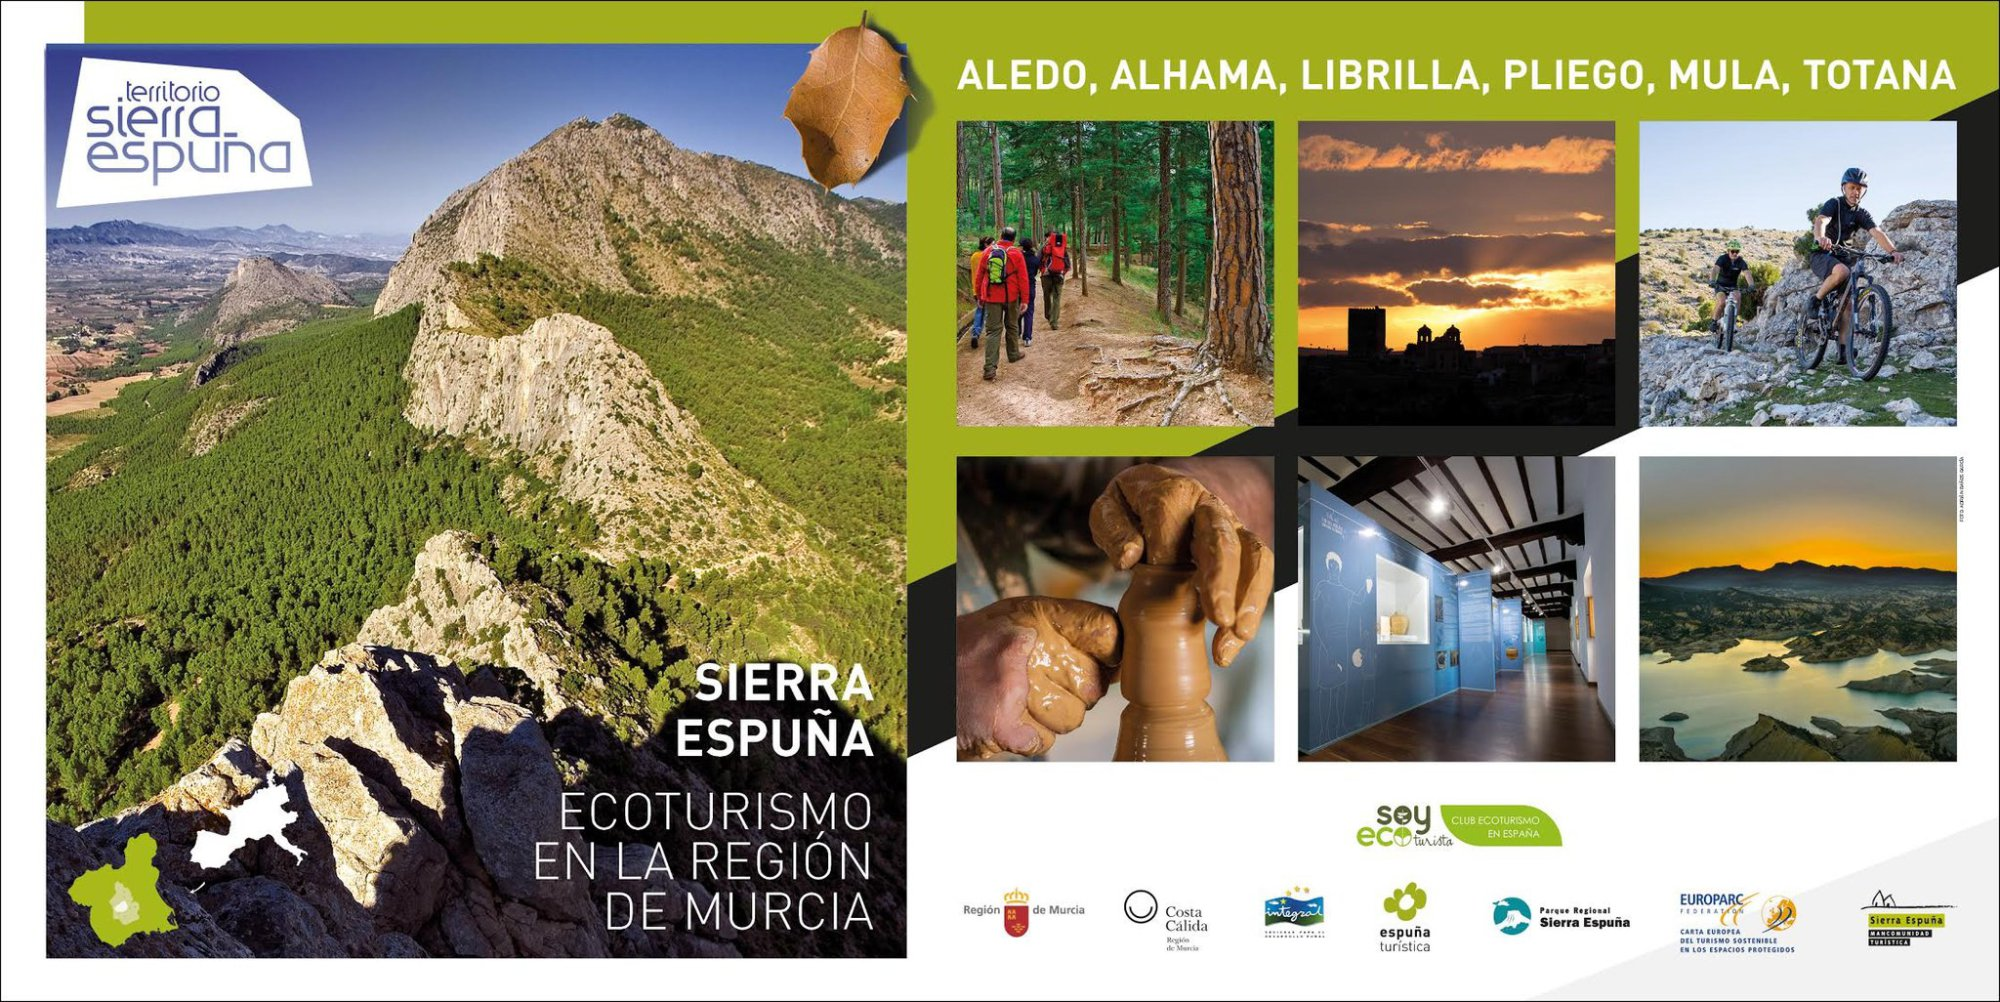 Ecoturismo en Agroeconatura